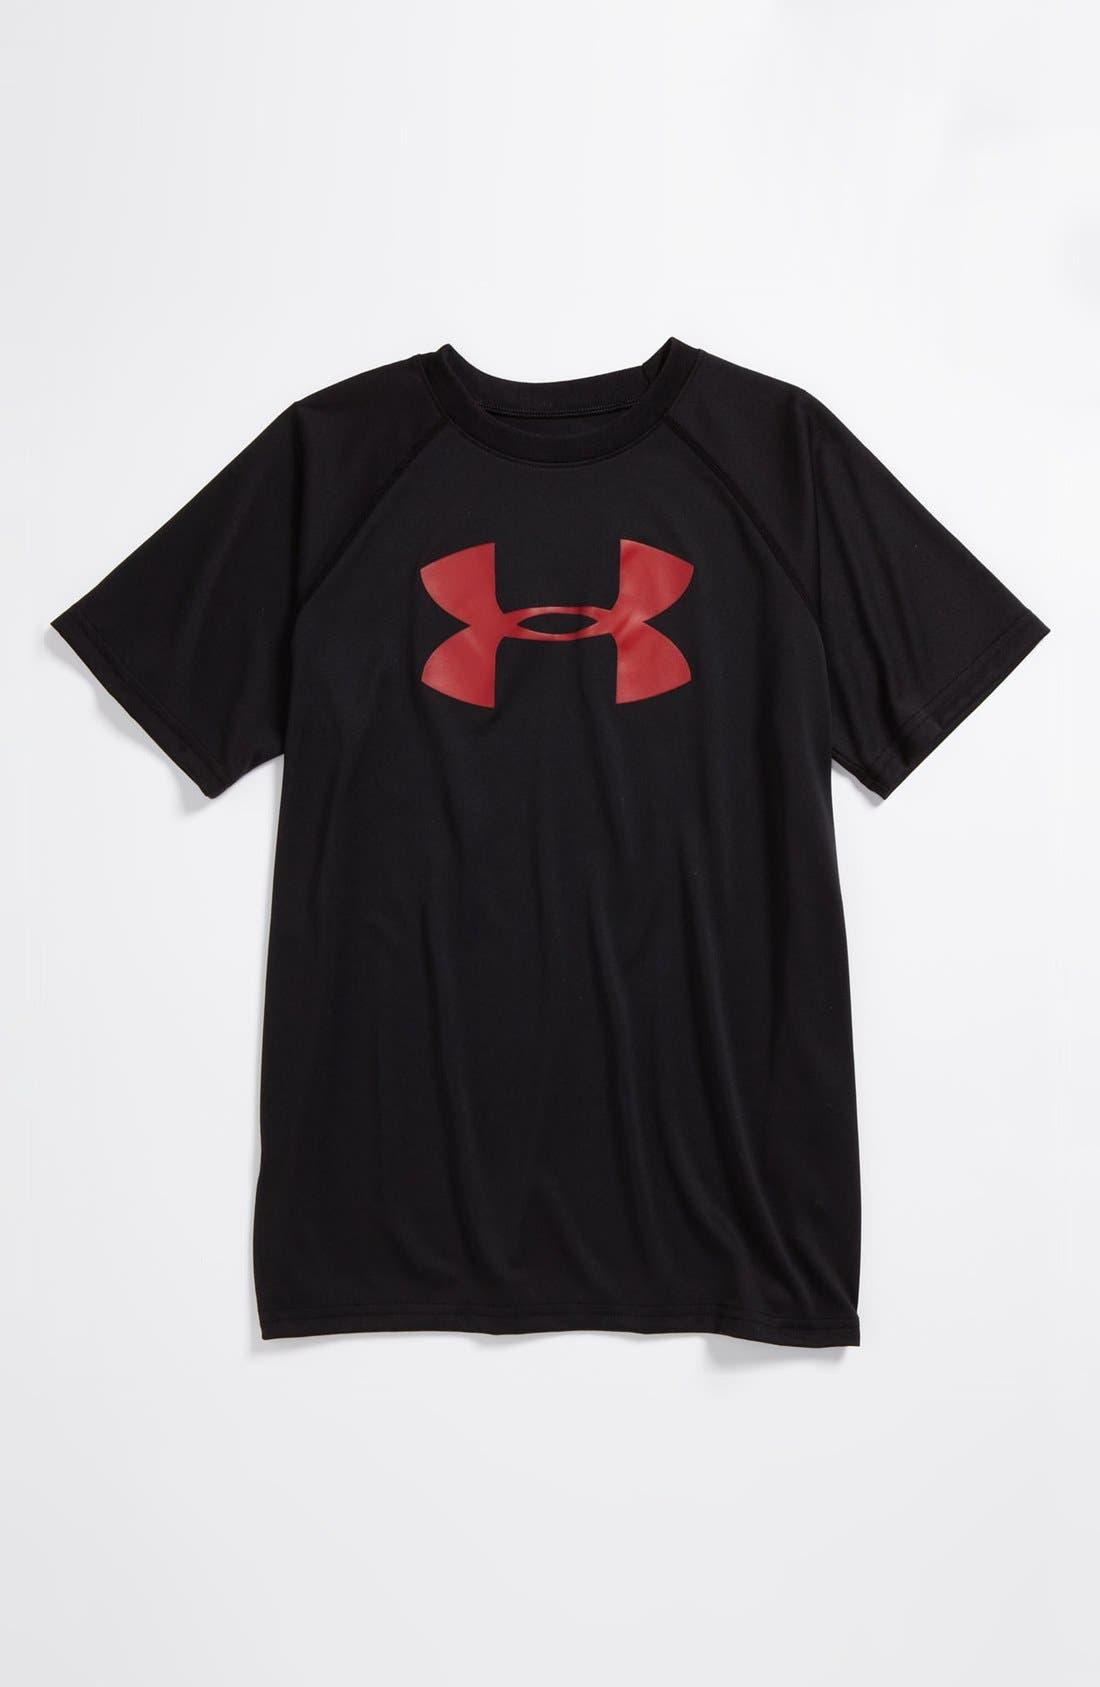 Alternate Image 1 Selected - Under Armour 'Big Logo' T-Shirt (Big Boys)